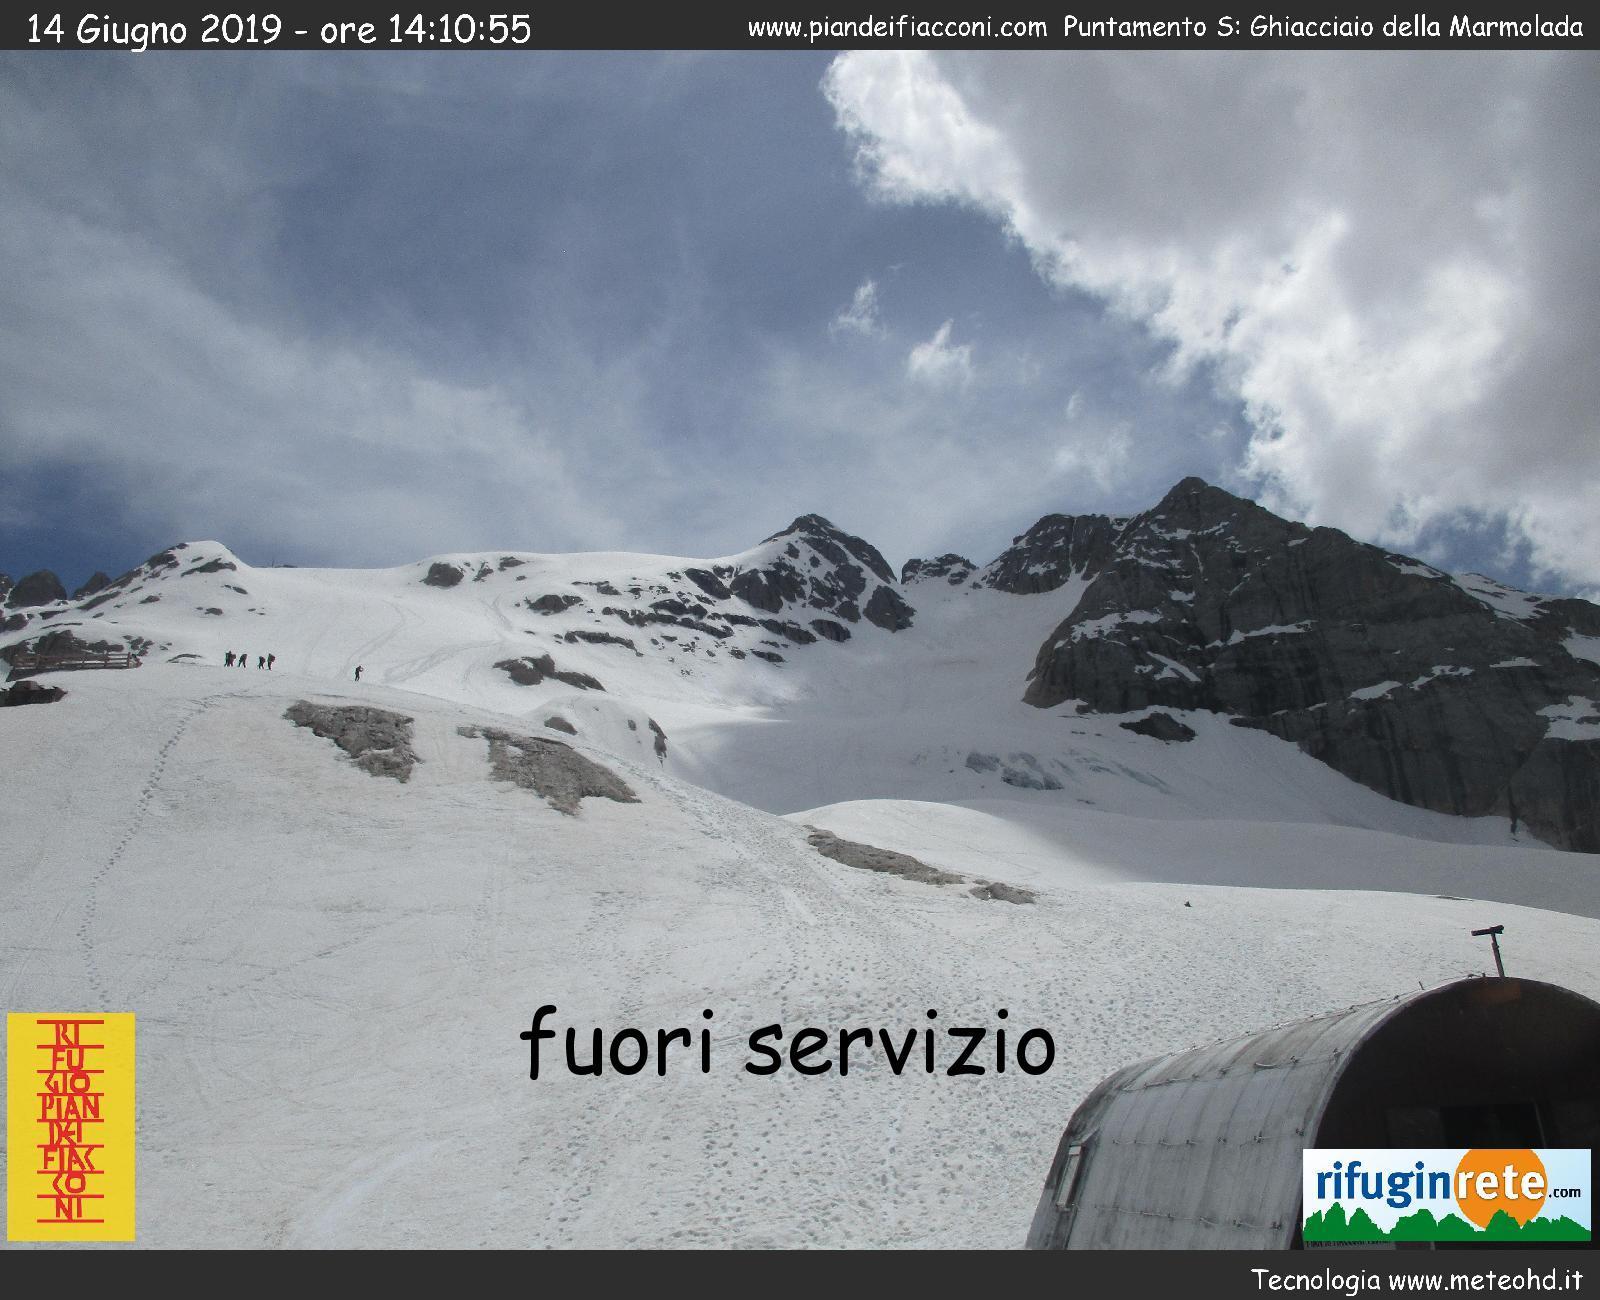 Webcam Ghiacciaio Marmolada